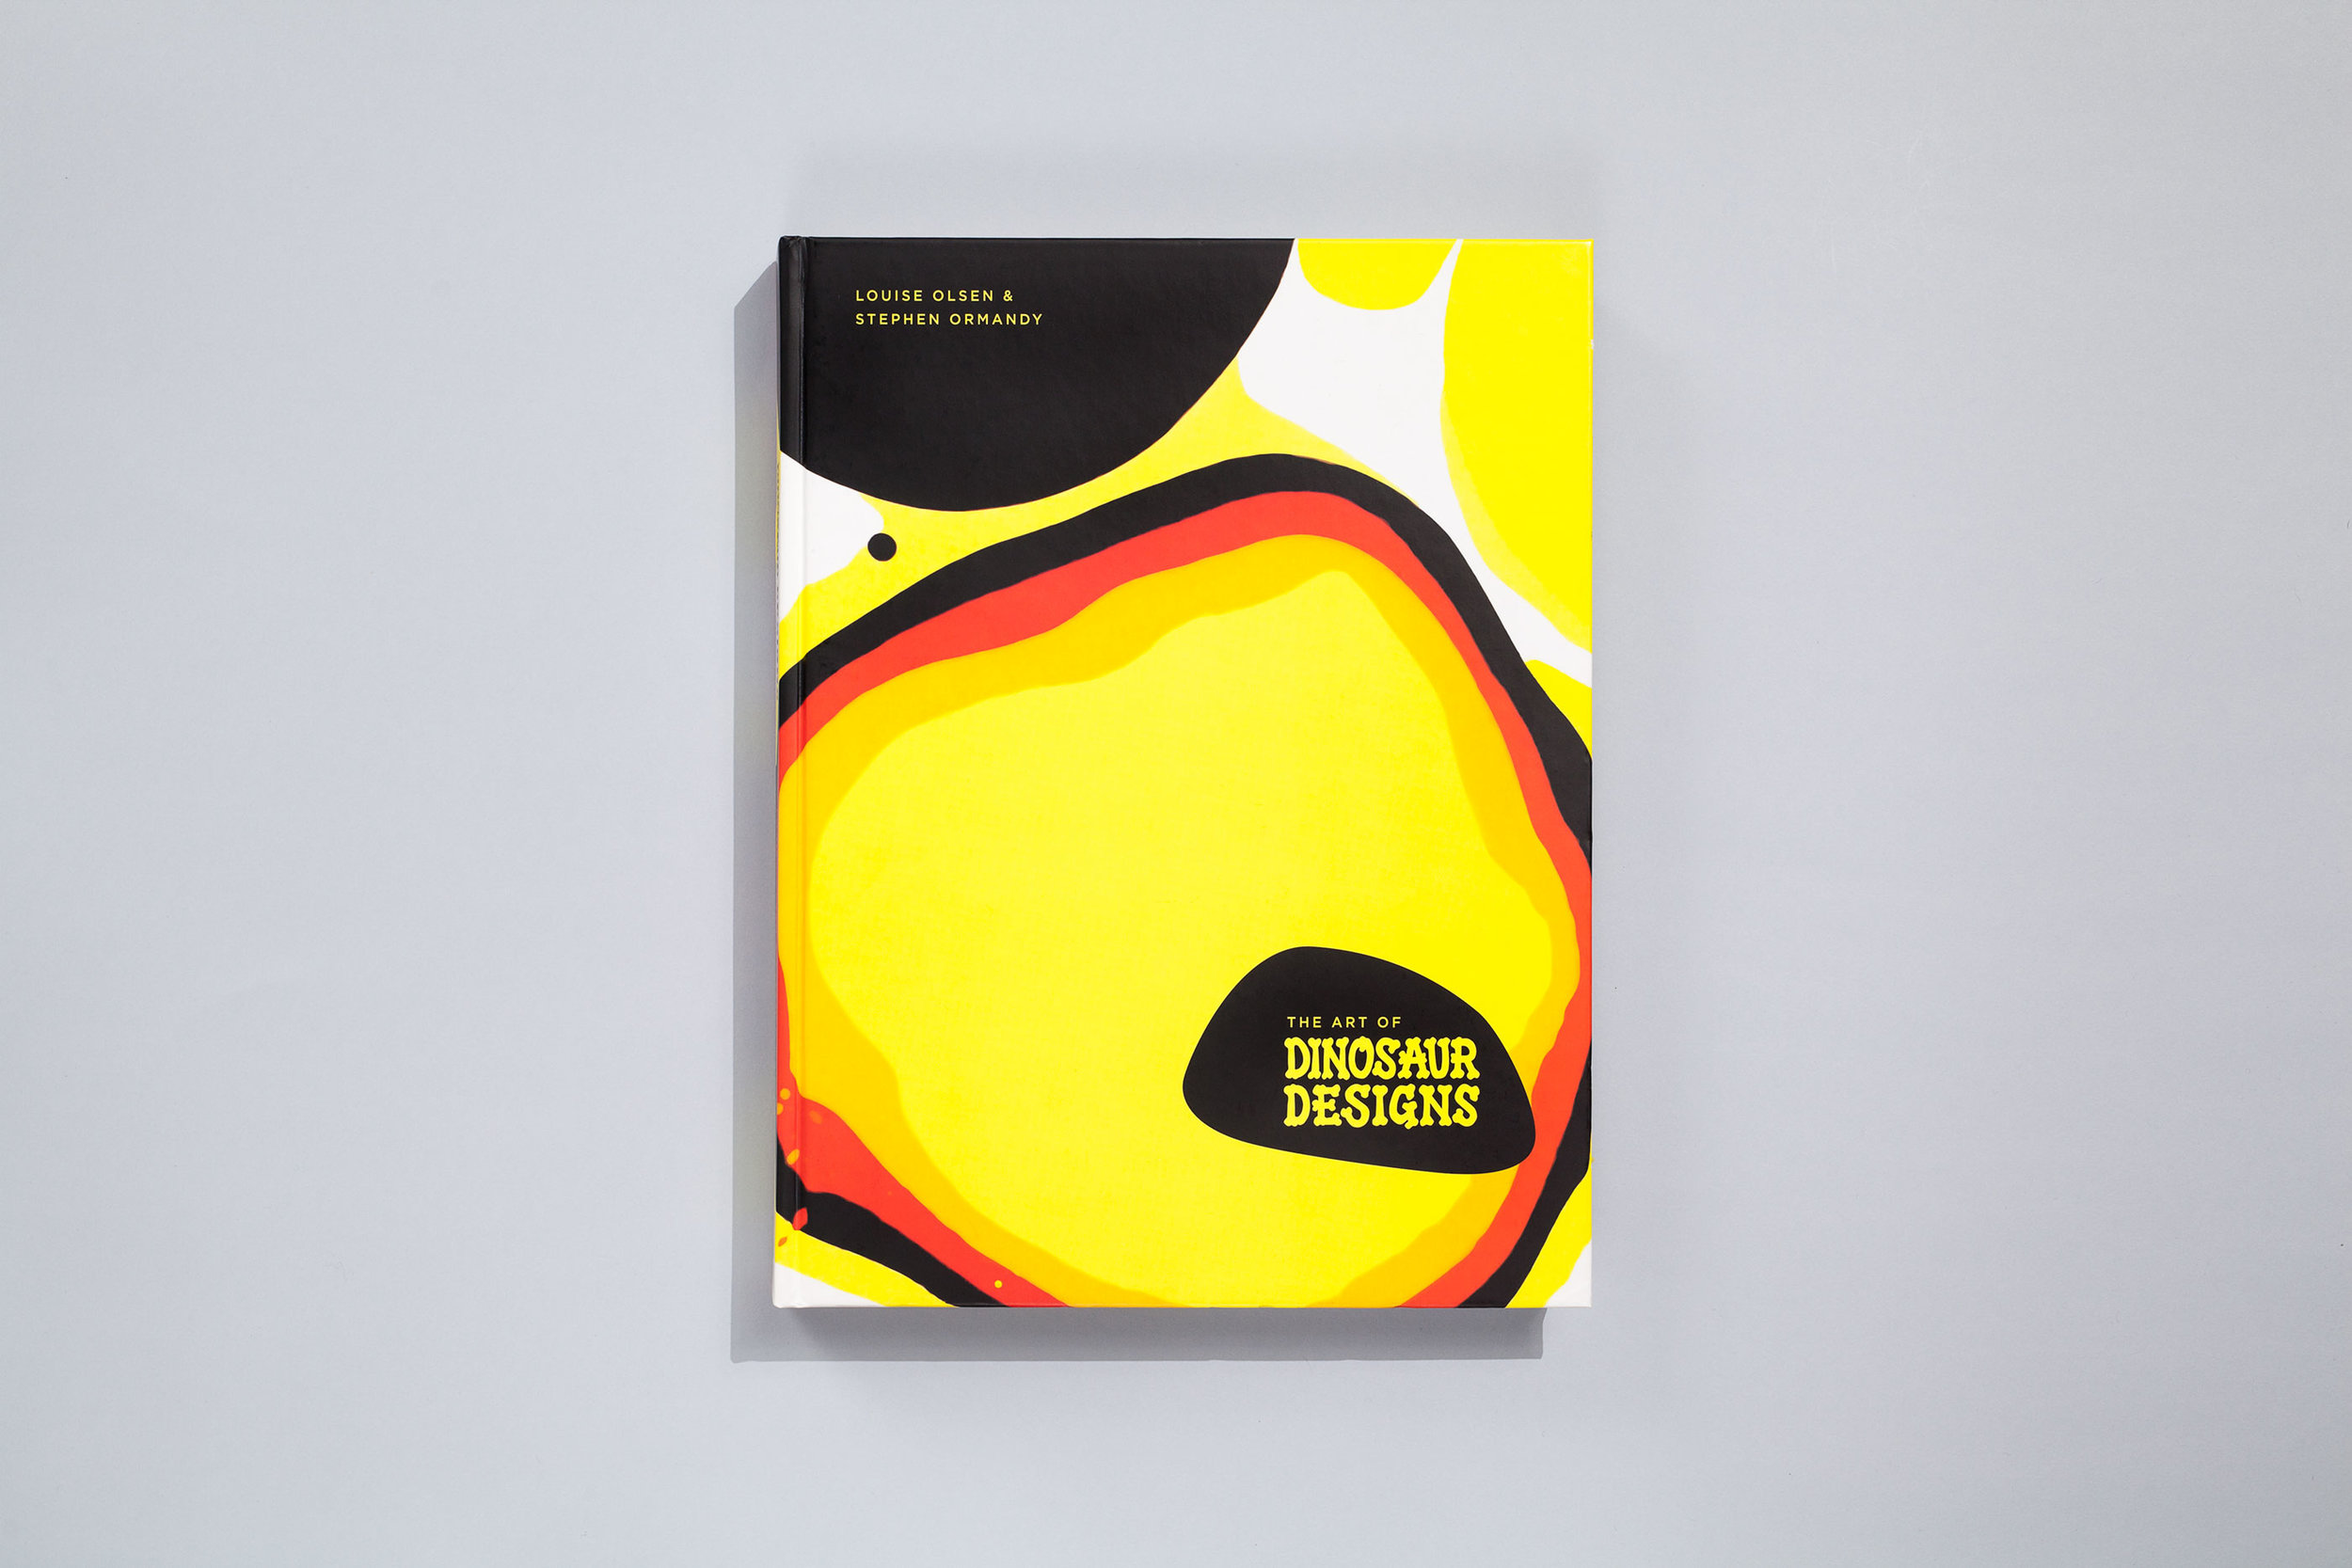 Title – The Art of Dinosaur Designs Authors – Louise Olsen & Stephen Ormandy with Georgina Safe Designer – Daniel New Photographers – Various Publisher – Lantern, Penguin Books